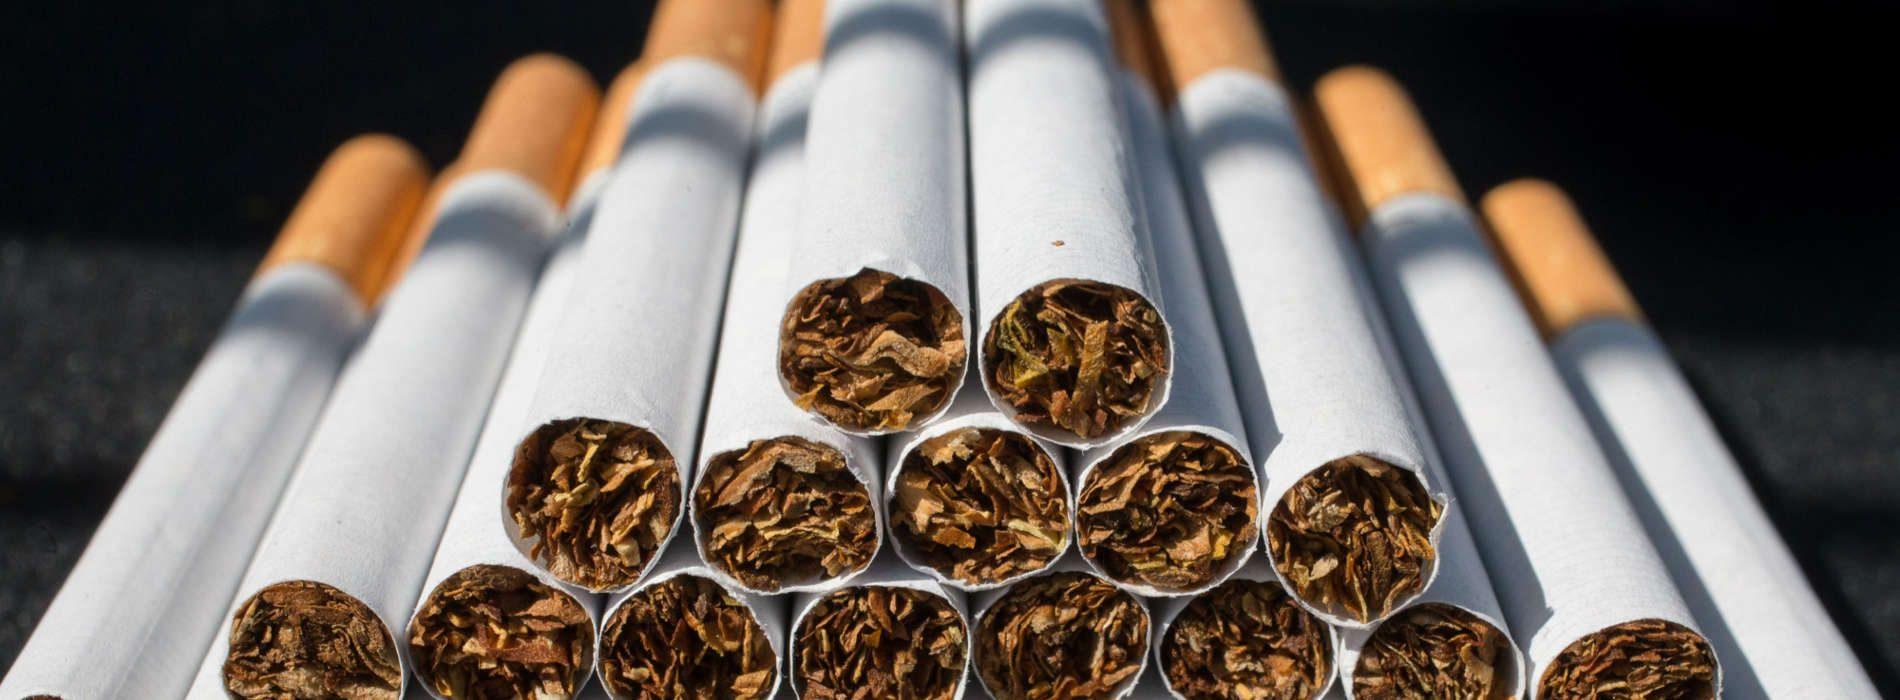 New cigarette plant to boost tobacco production